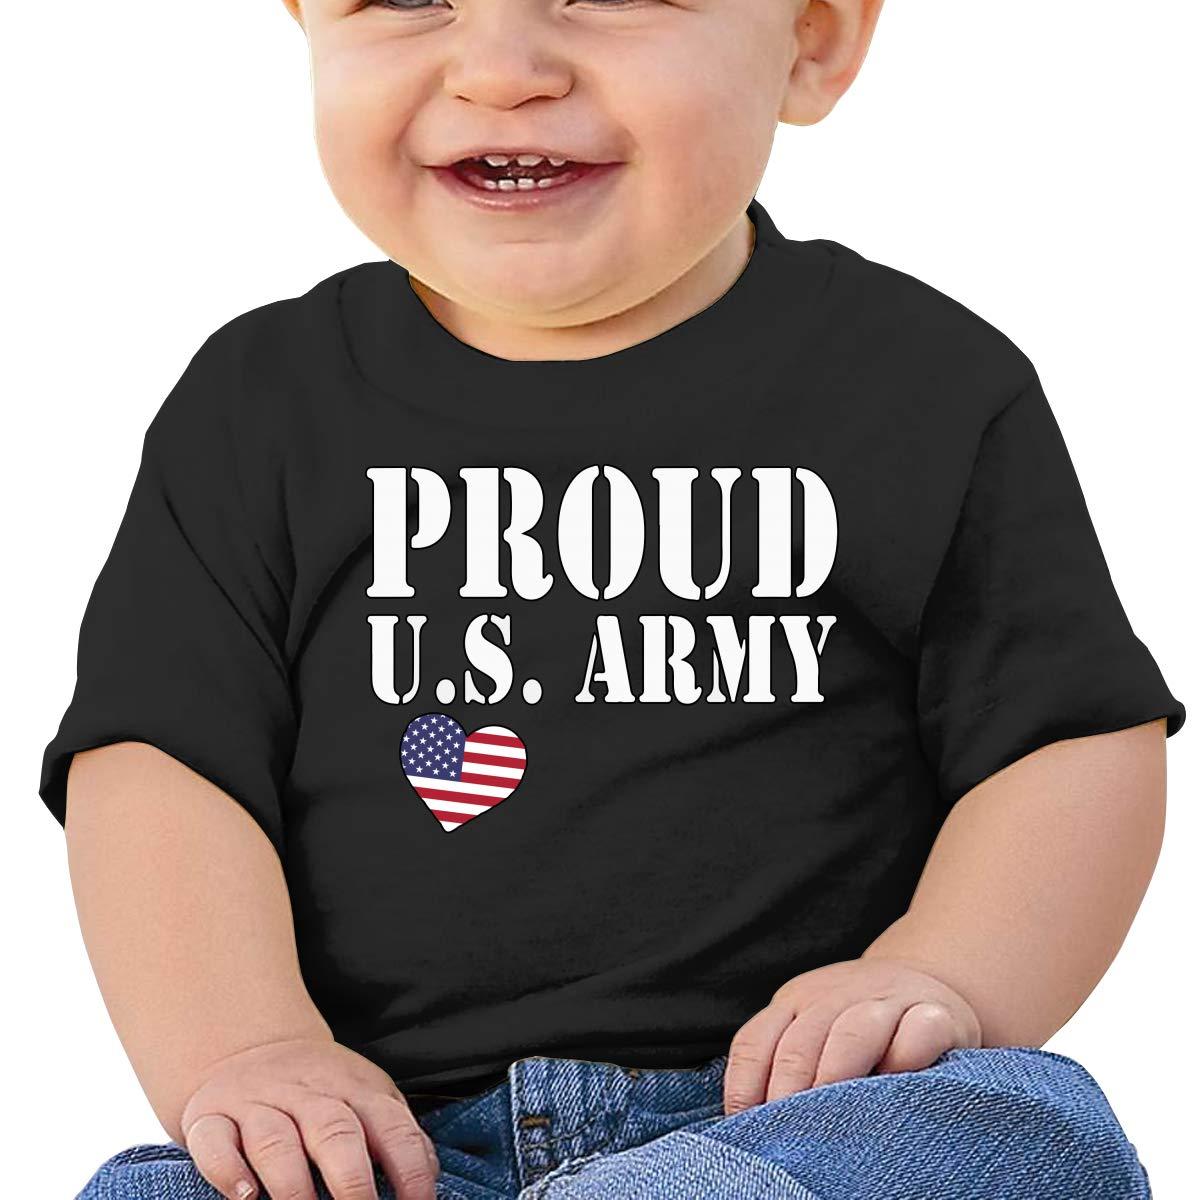 Proud U.S ZUGFGF-S3 Pride Military Army Boy Girl Newborn Short Sleeve T Shirts 6-24 Month Cotton Tops